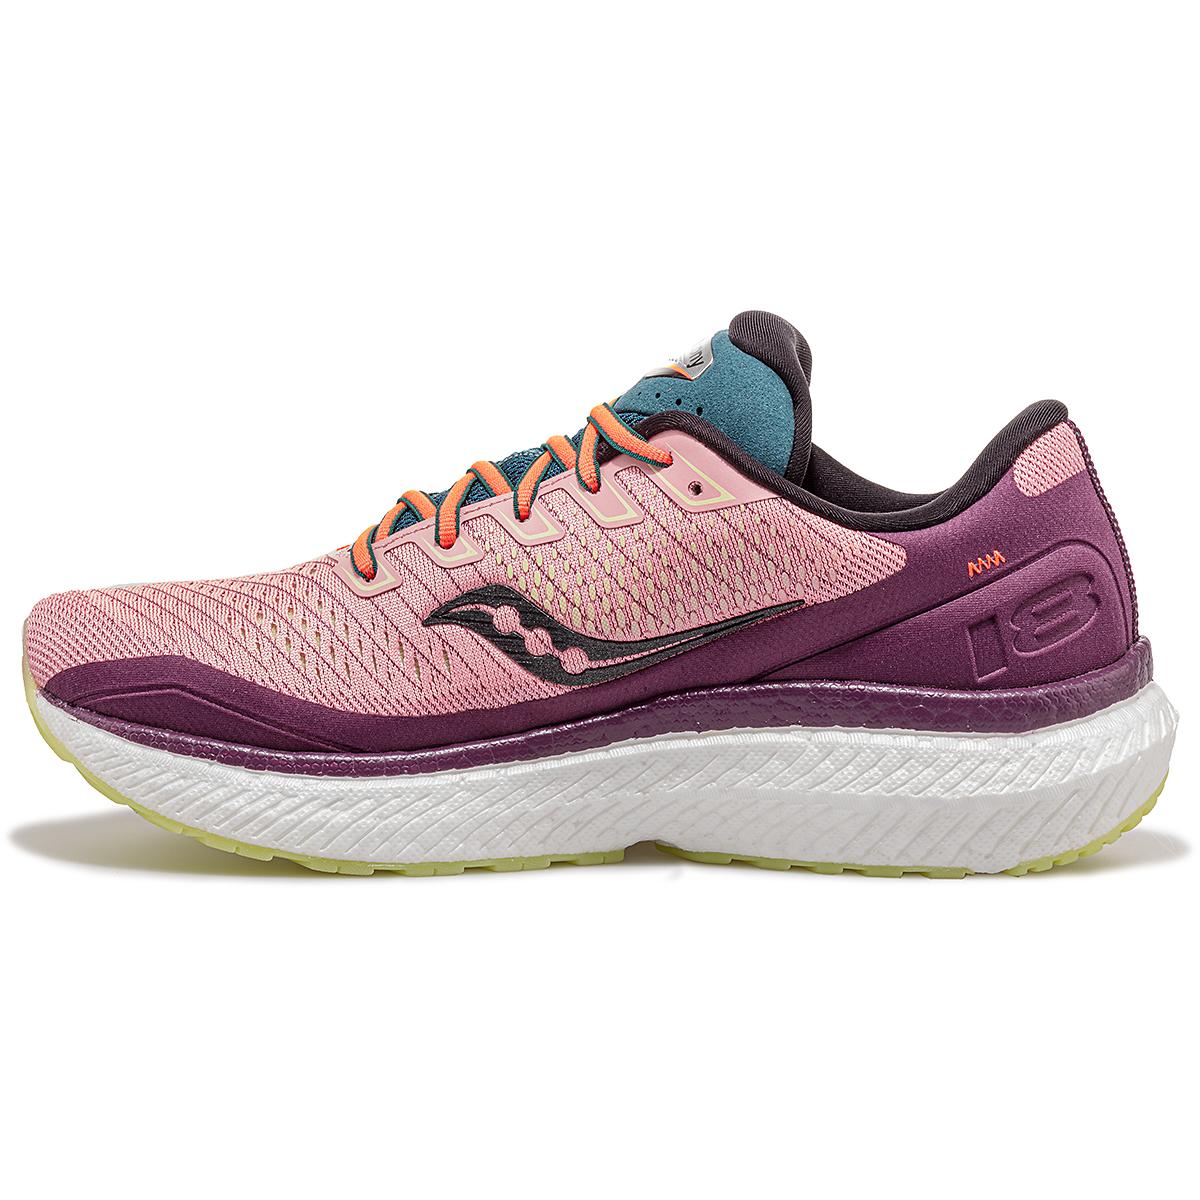 Women's Saucony Jackalope 2.0 Triumph 18 Running Shoe - Color: Jackalope - Size: 5 - Width: Regular, Jackalope, large, image 4